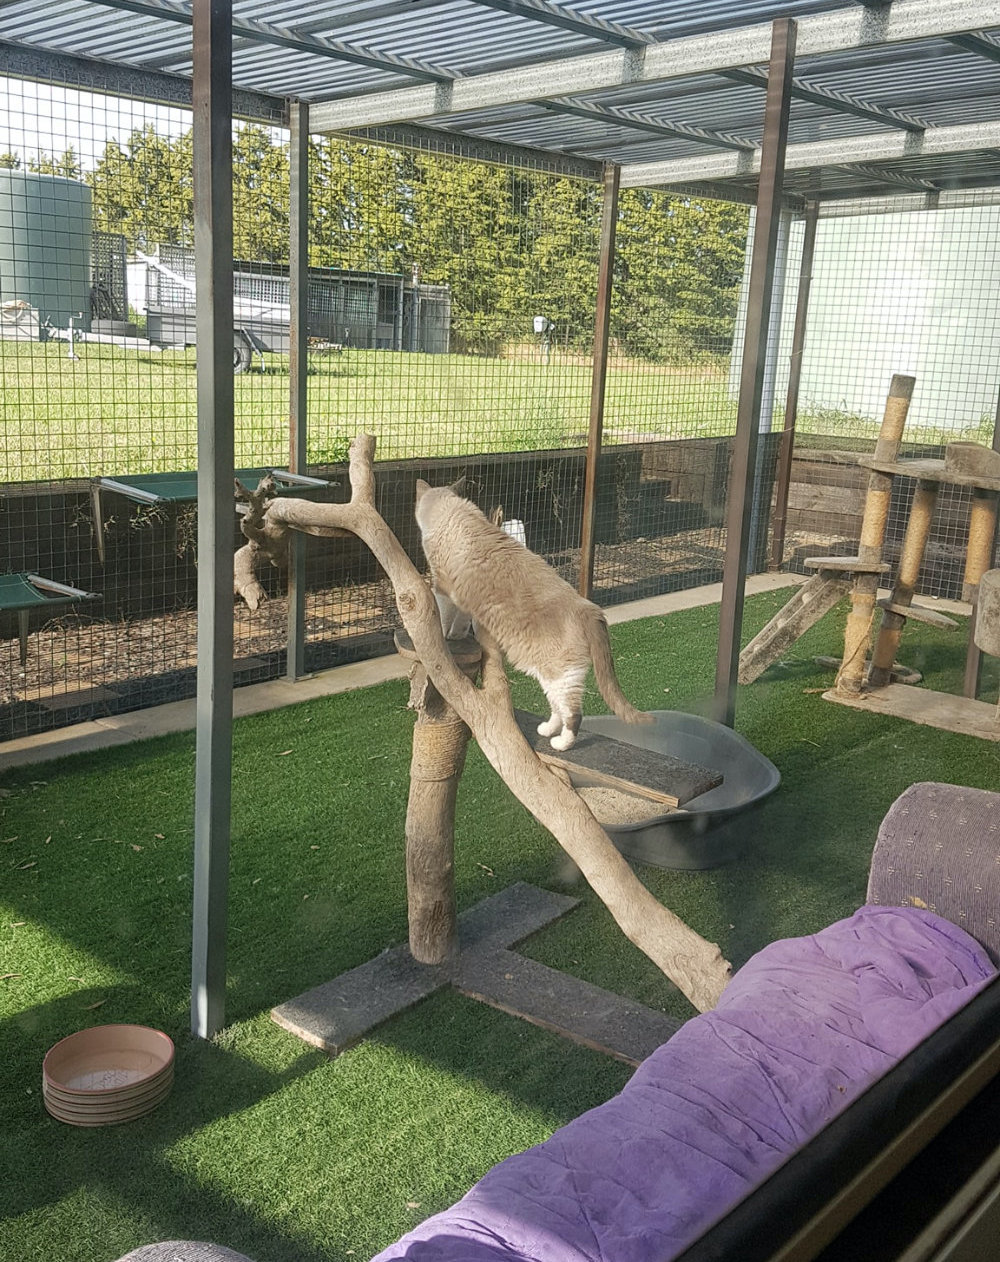 Cat in play enclosure